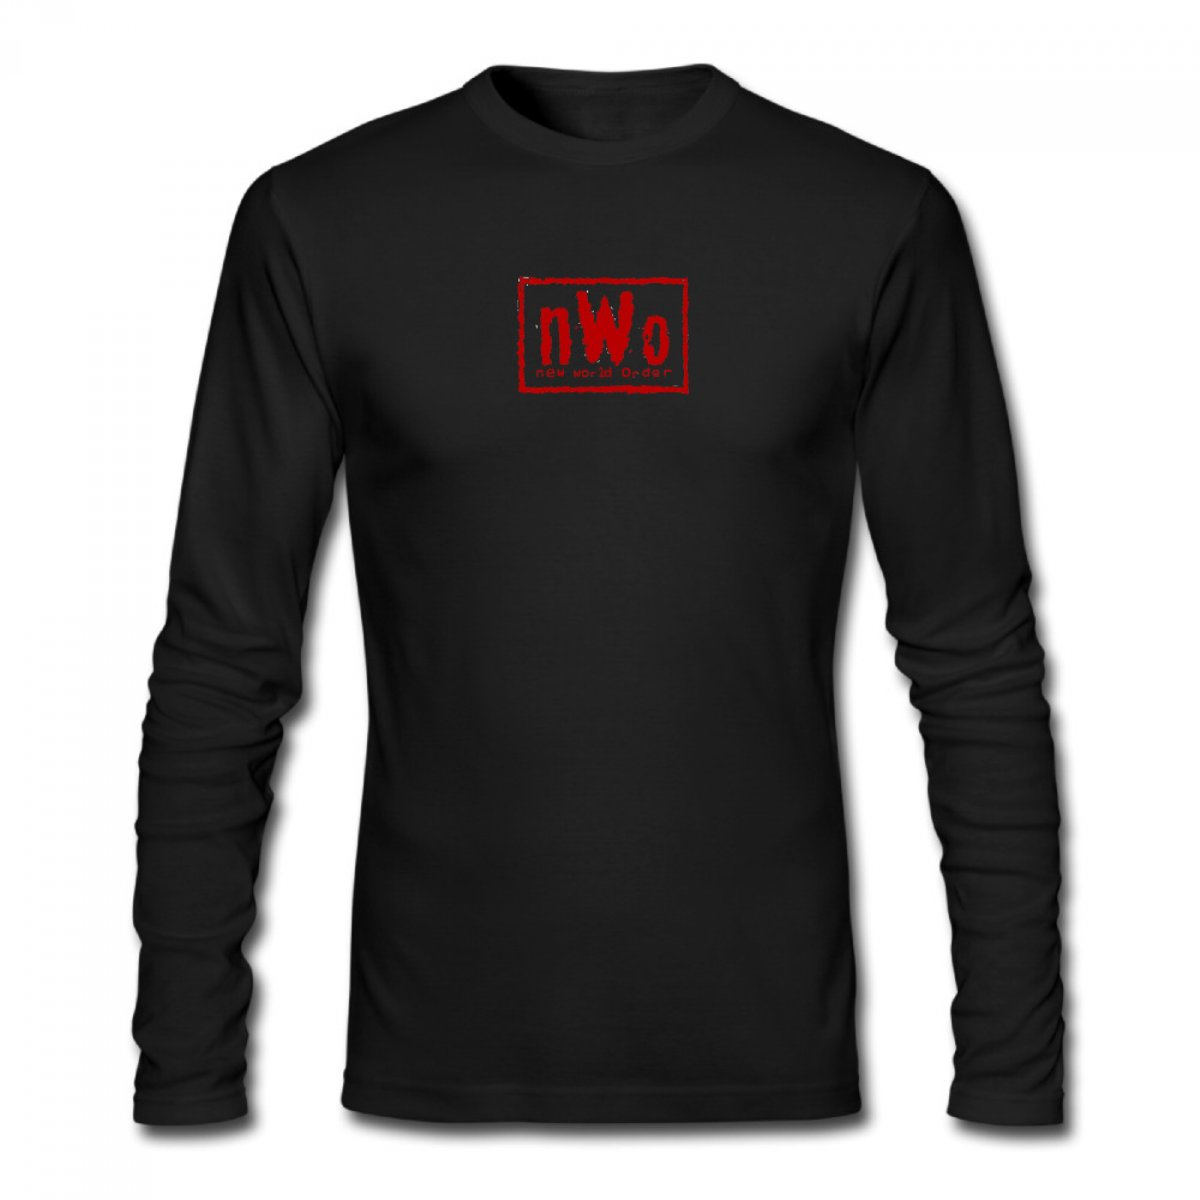 New world order logo c men 39 s long sleeve t shirt tanga for Order shirts with logo